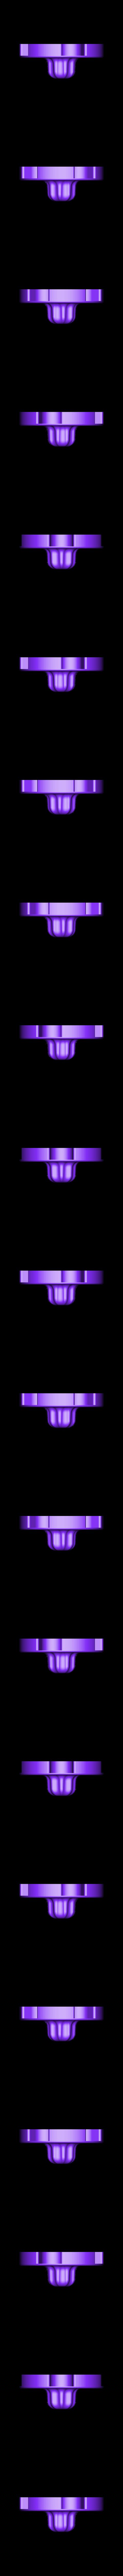 roue_4.stl Download free STL file Pocket Downfall - 10 de chute de poche • Design to 3D print, lipki